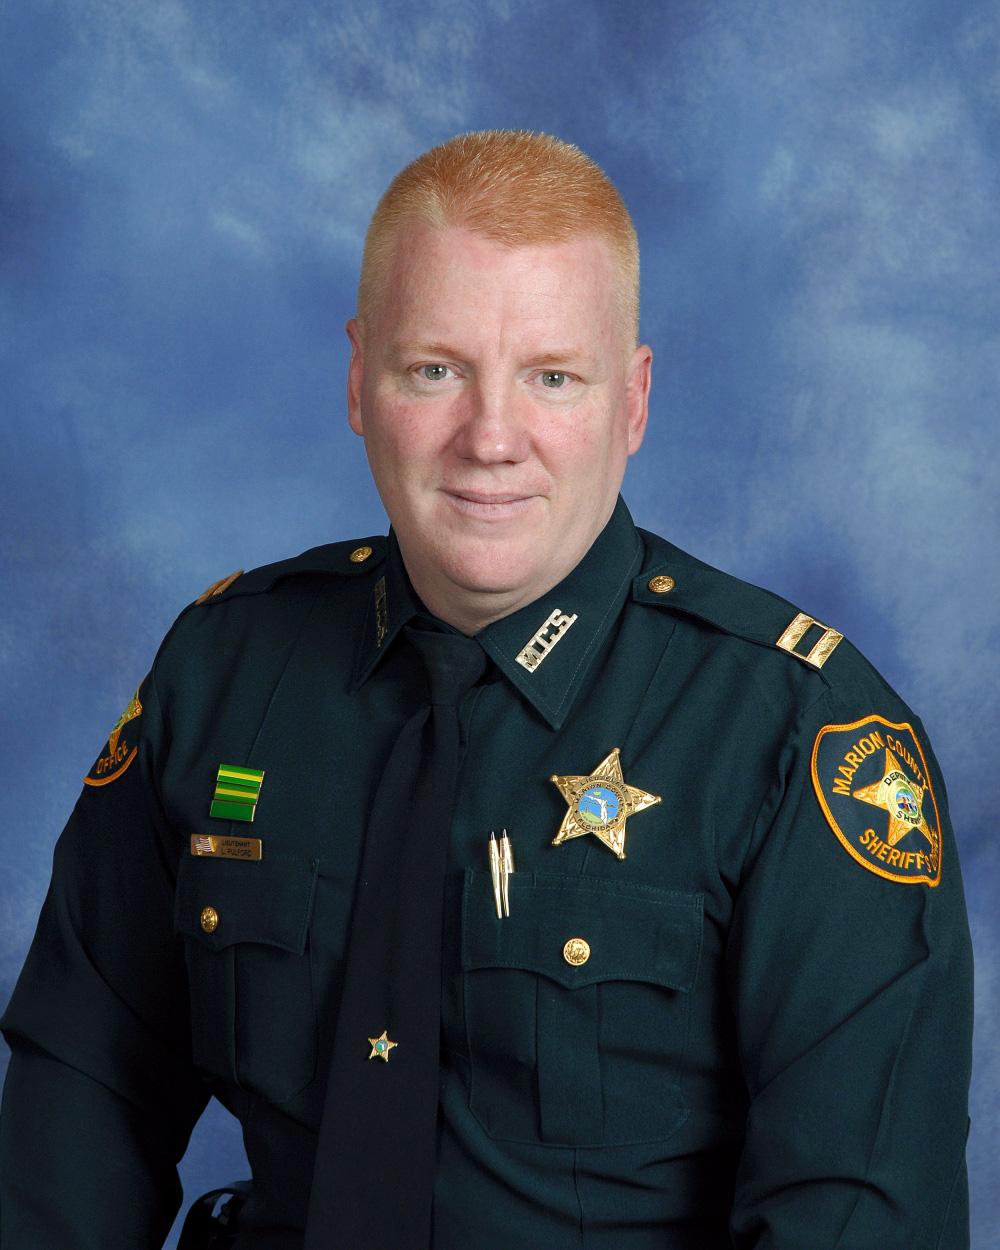 Captain Louis Pulford Criminal Investigations Division lpulford@marionso.com